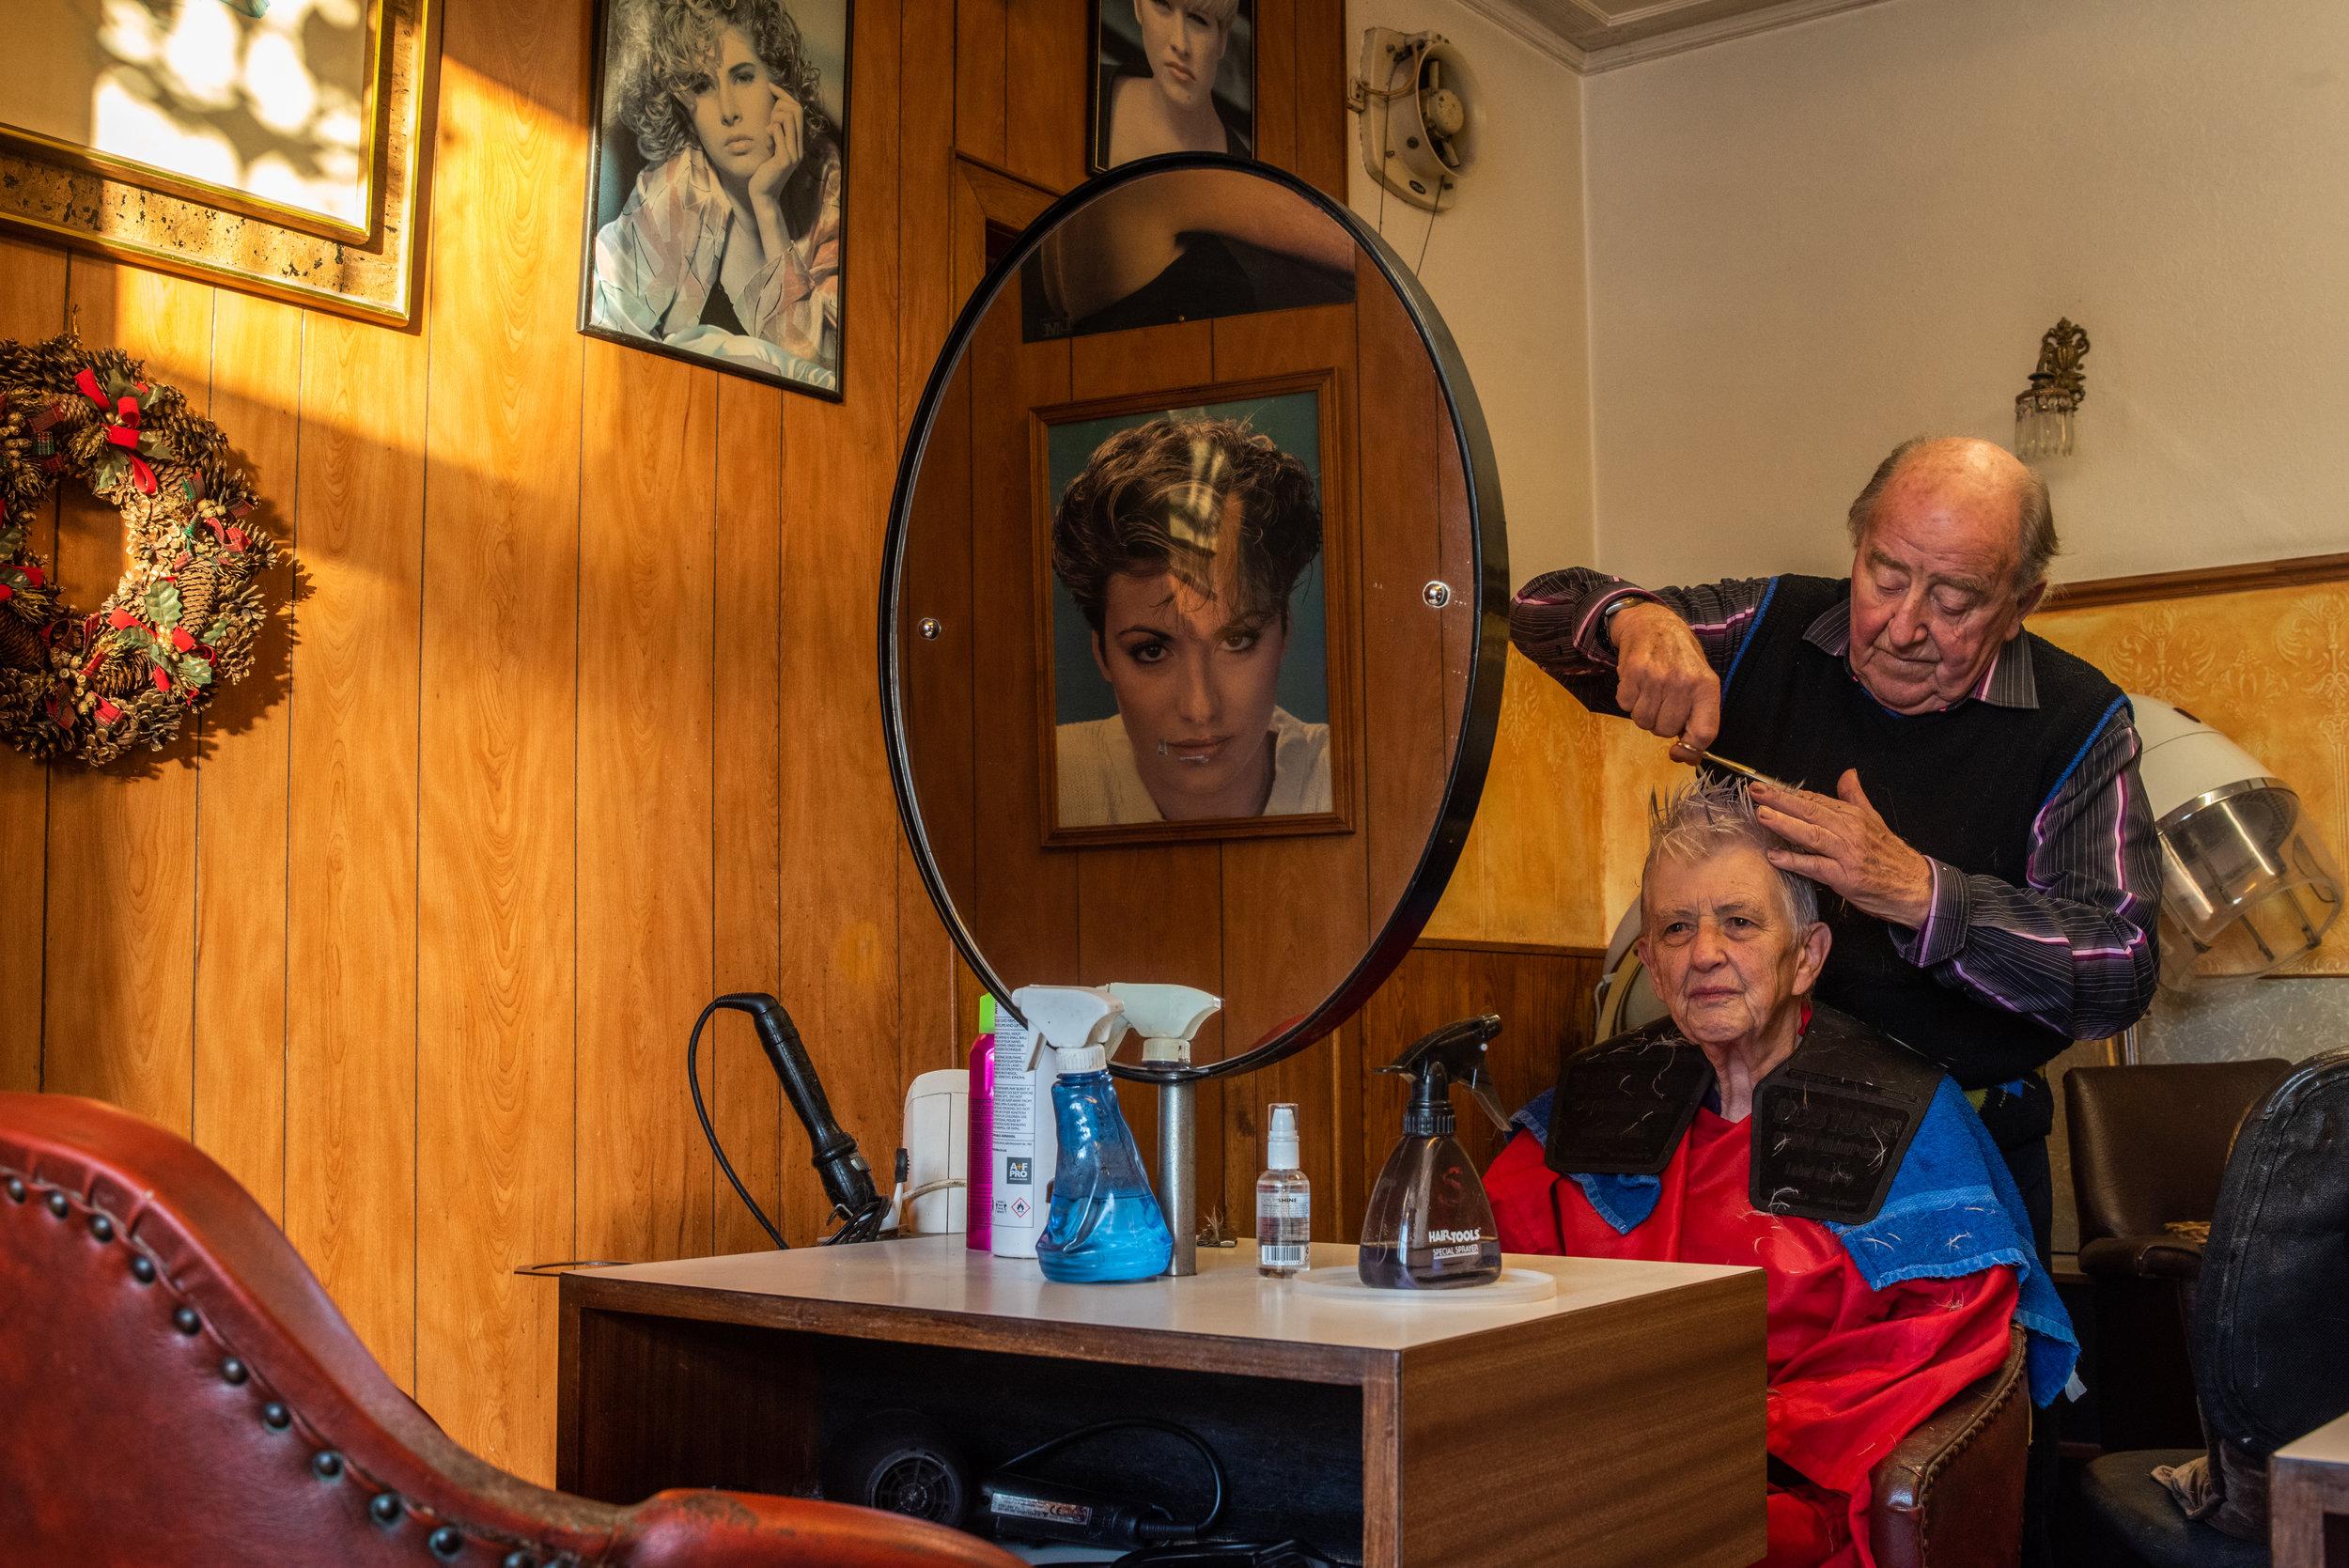 60s Haircut, 2018